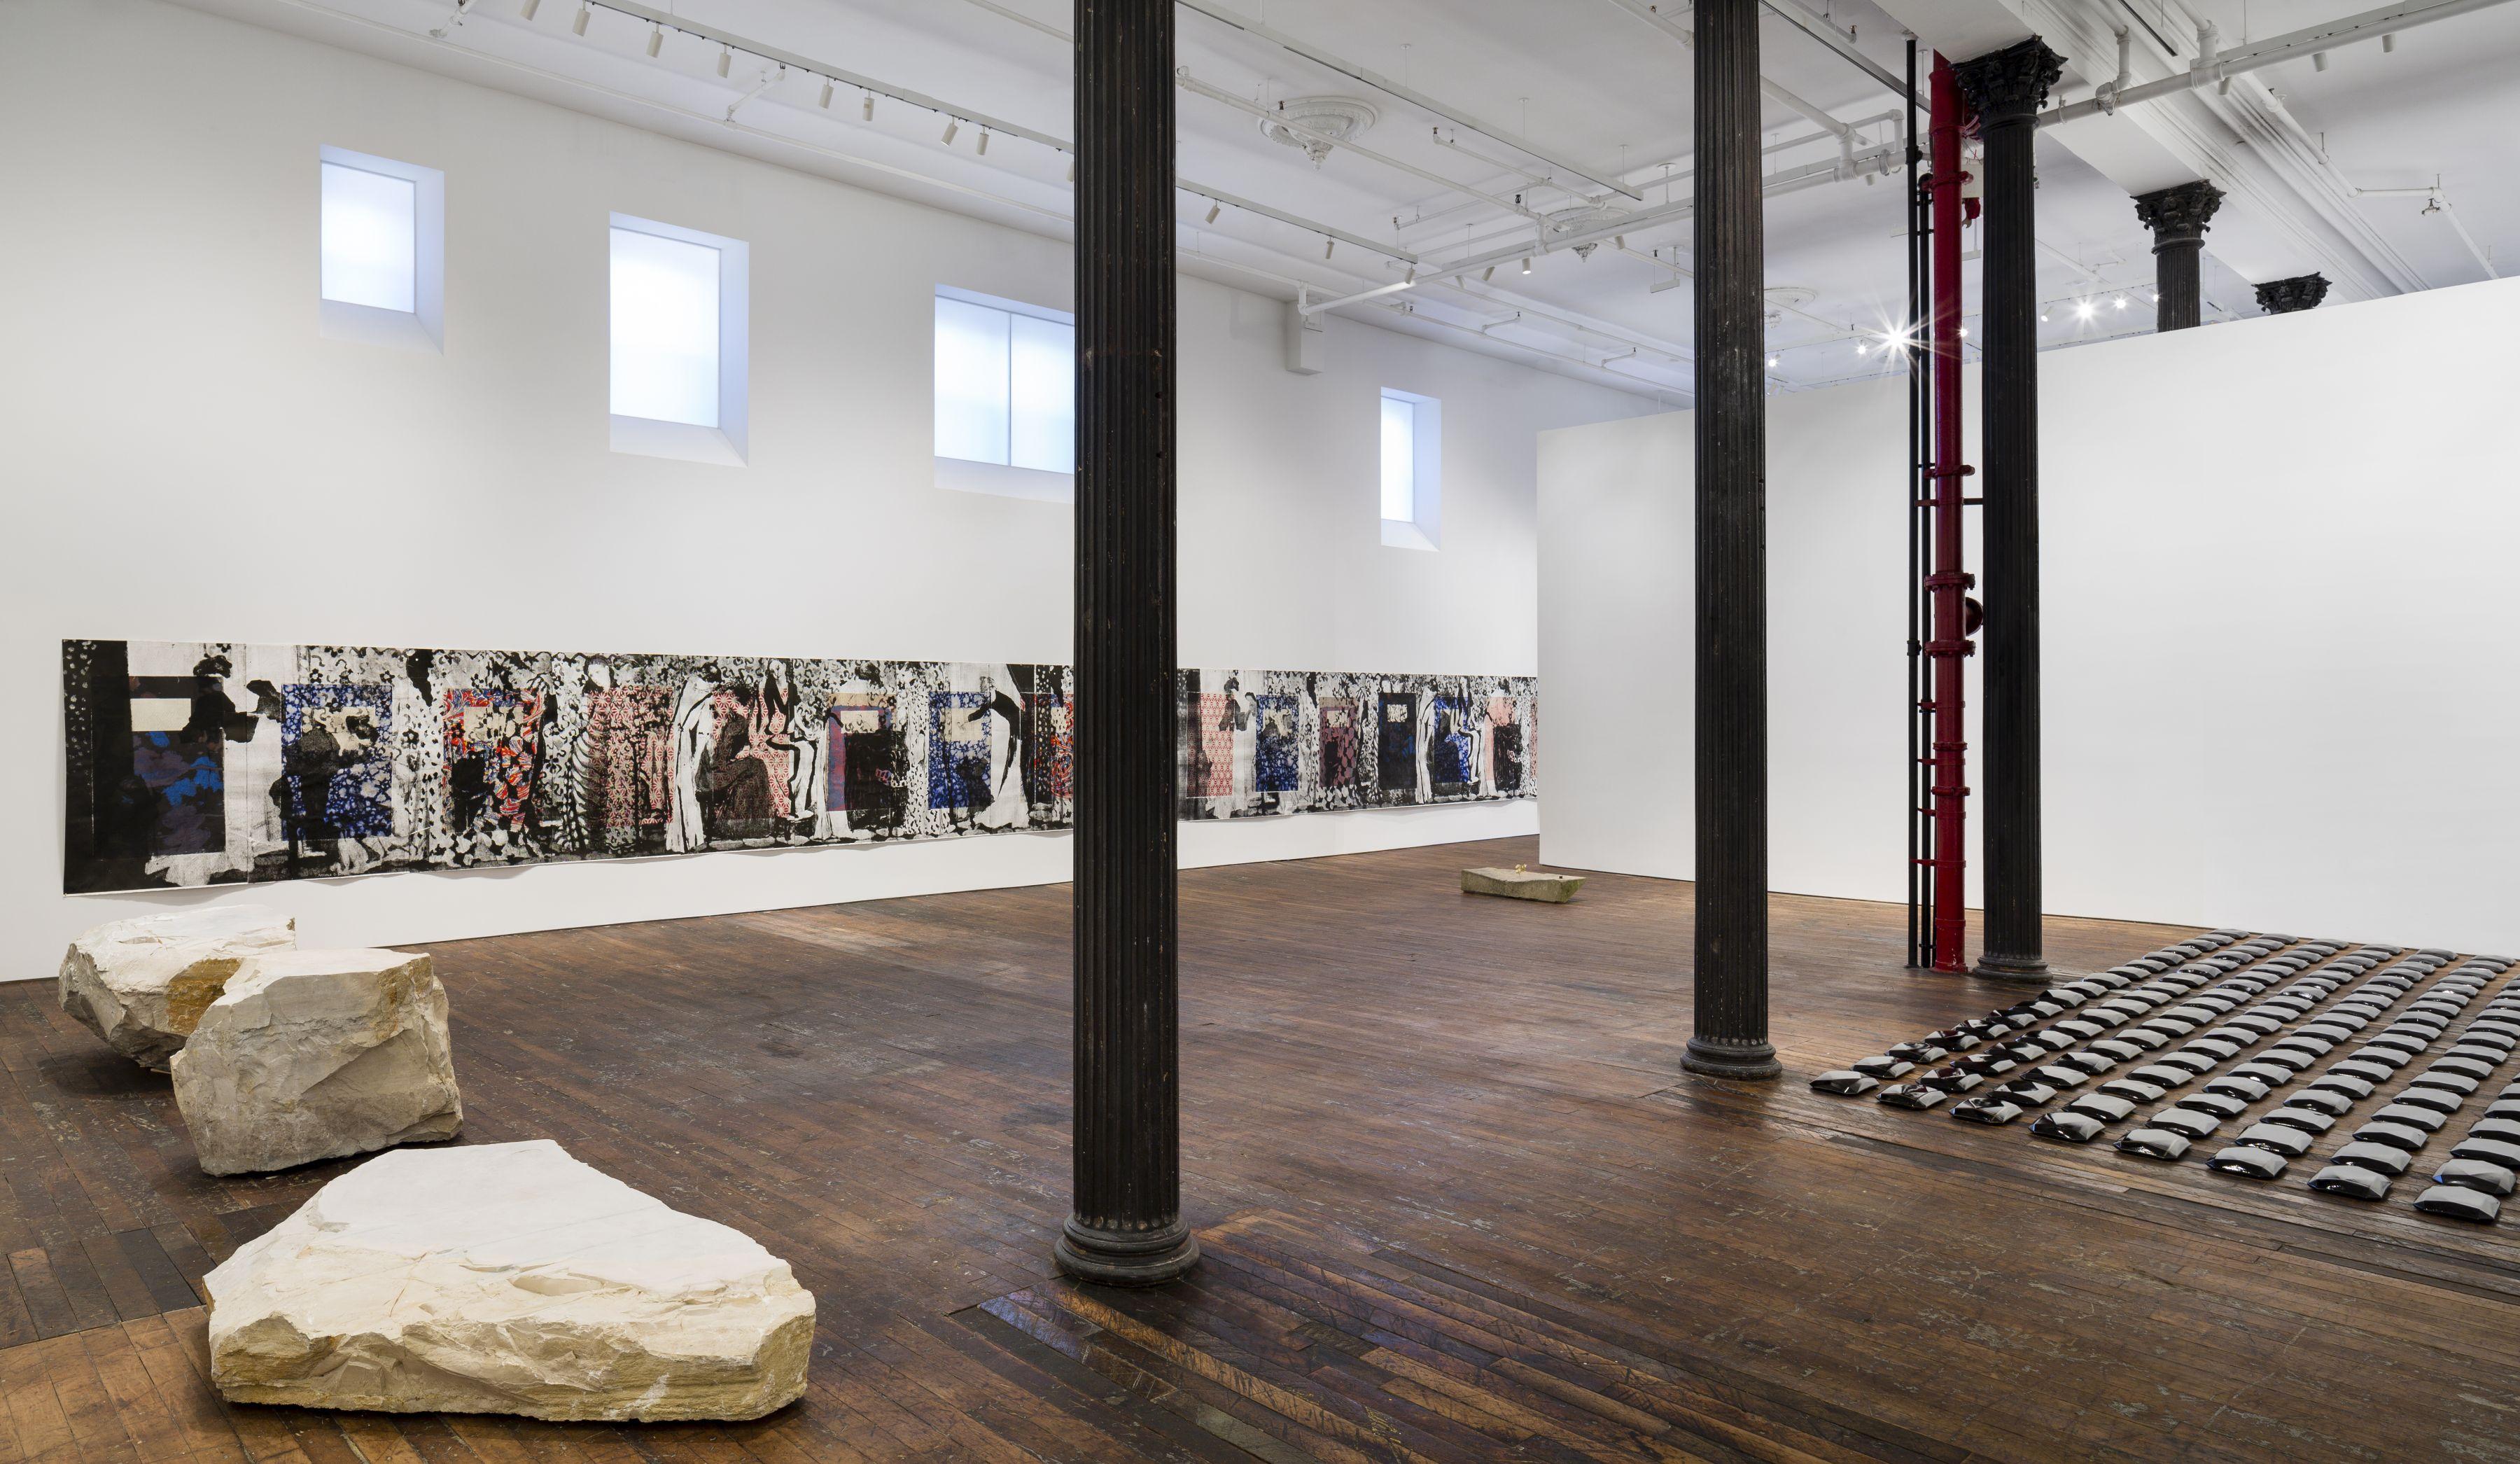 Lucy Skaer: Random House– installation view 7